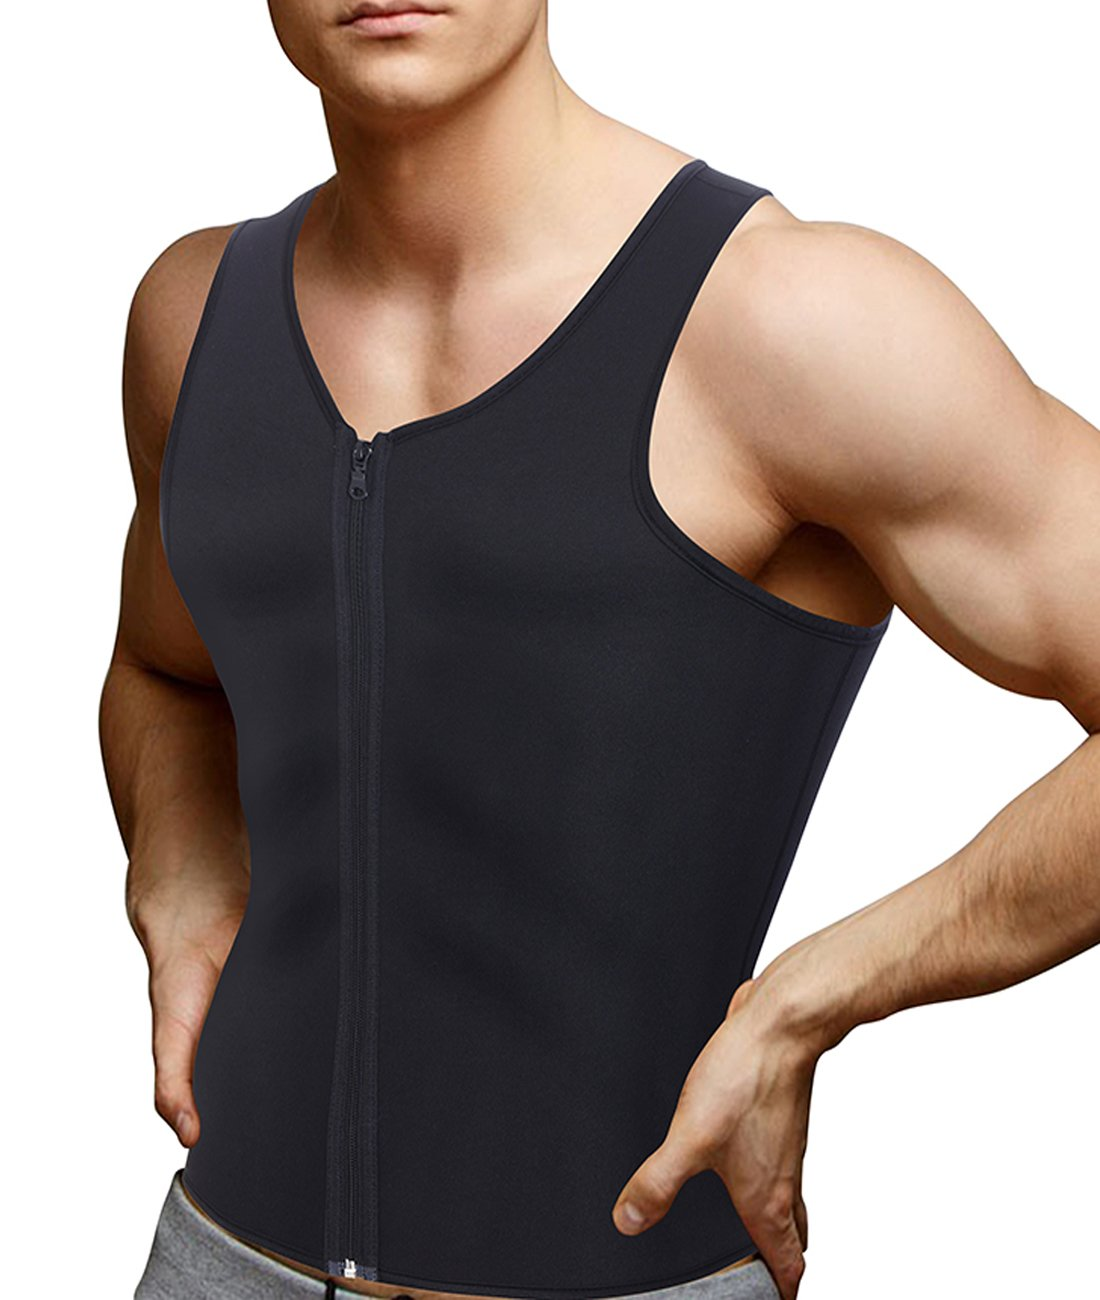 Men's Body Shaper Sauna Vest Neoprene Tank Top Weight Loss, Burn More Fat and Produce Heat for Workouts Shapewear